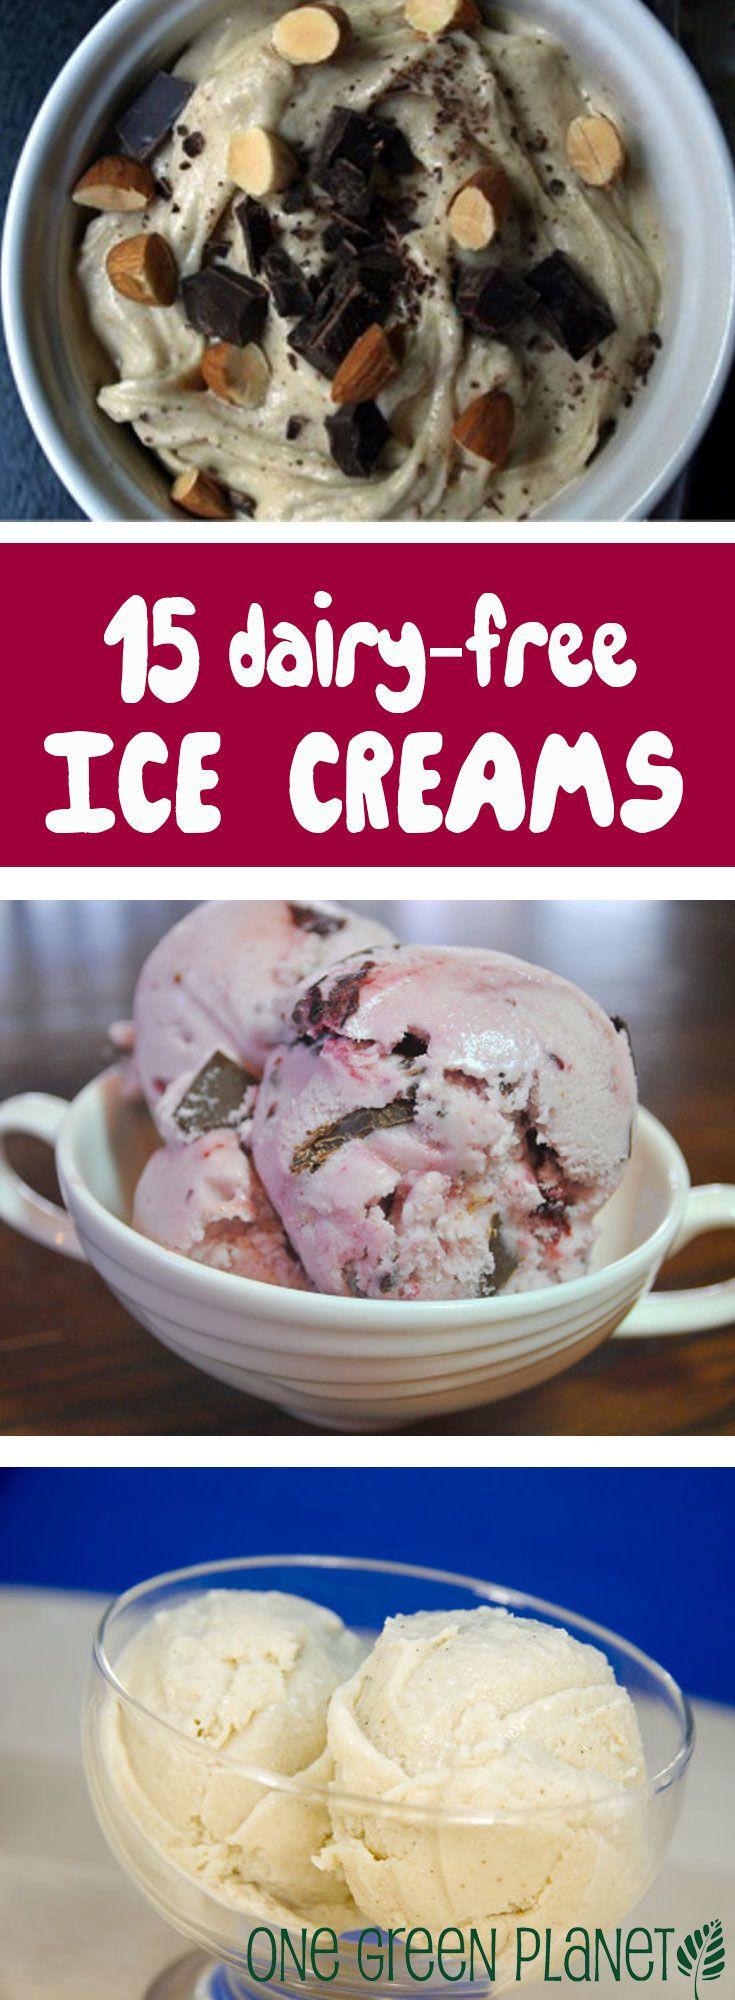 15 Dairy-free Ice Creams to Enjoy This Summer http://onegr.pl/1qZdATG #summer #vegan #recipe